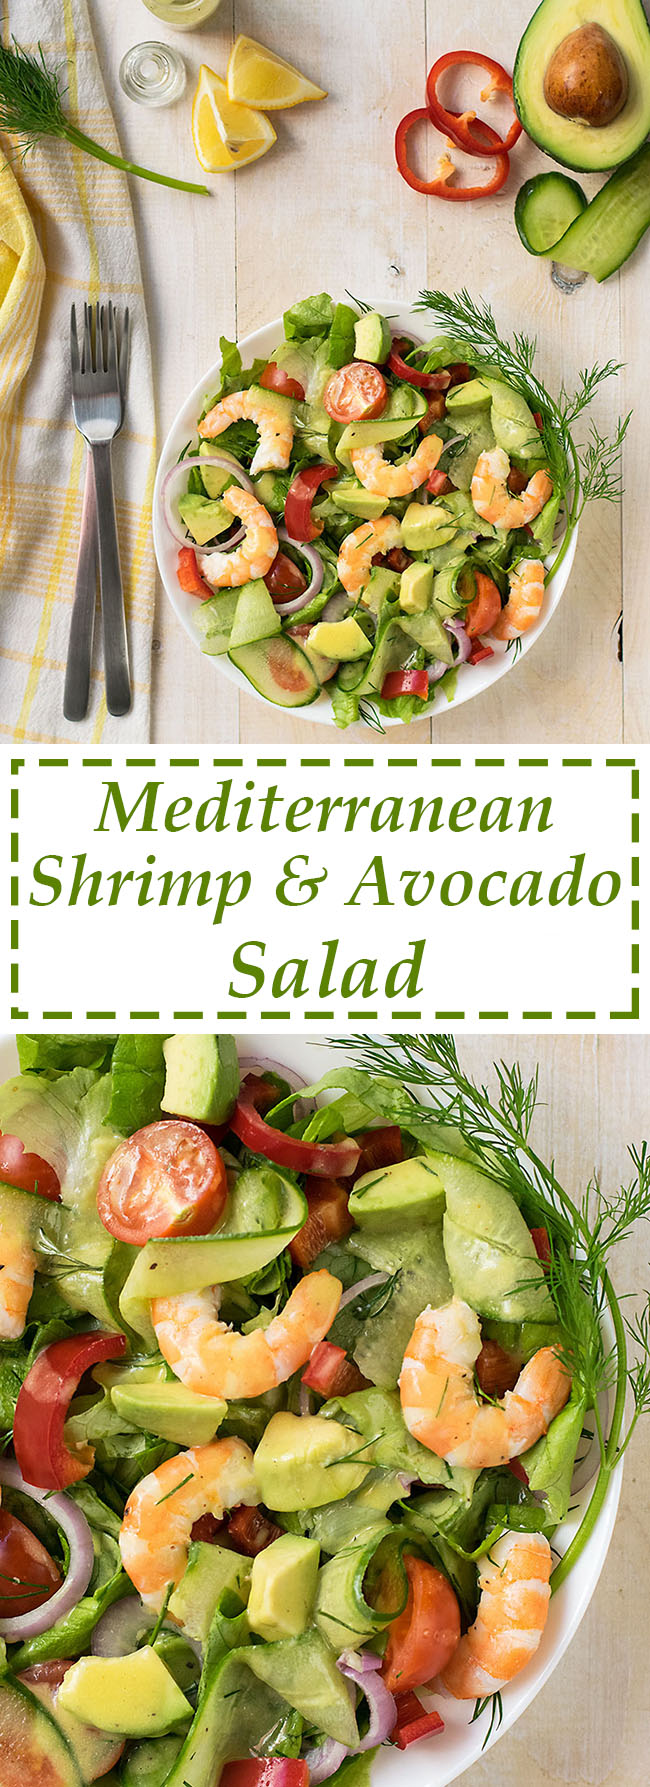 Mediterranean shrimp and avocado salad 5